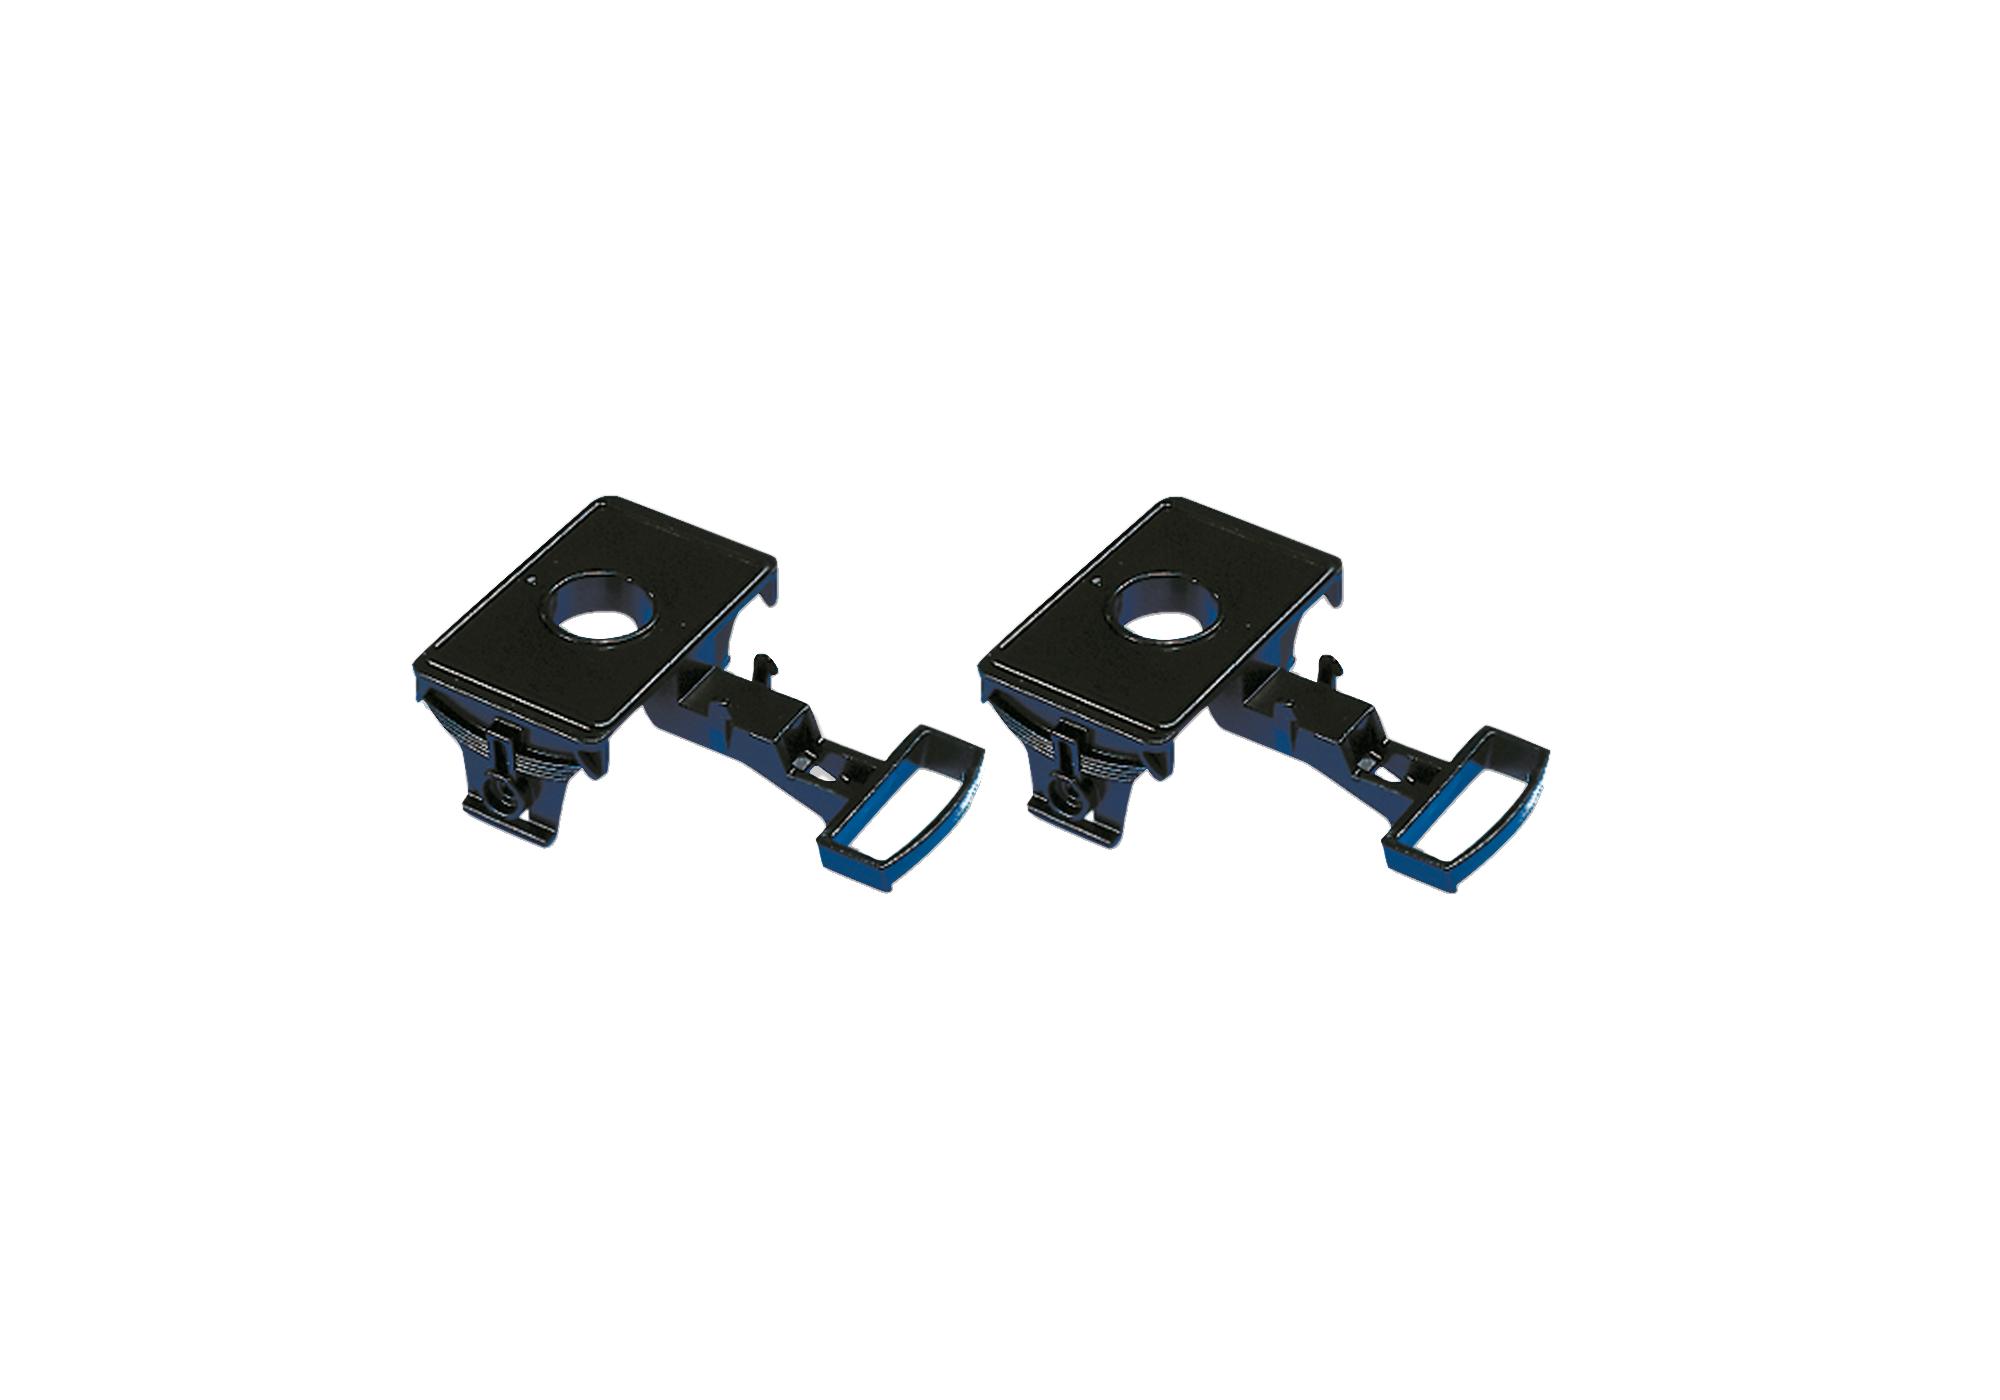 http://media.playmobil.com/i/playmobil/7561_product_detail/Deux porte-essieux pivotants